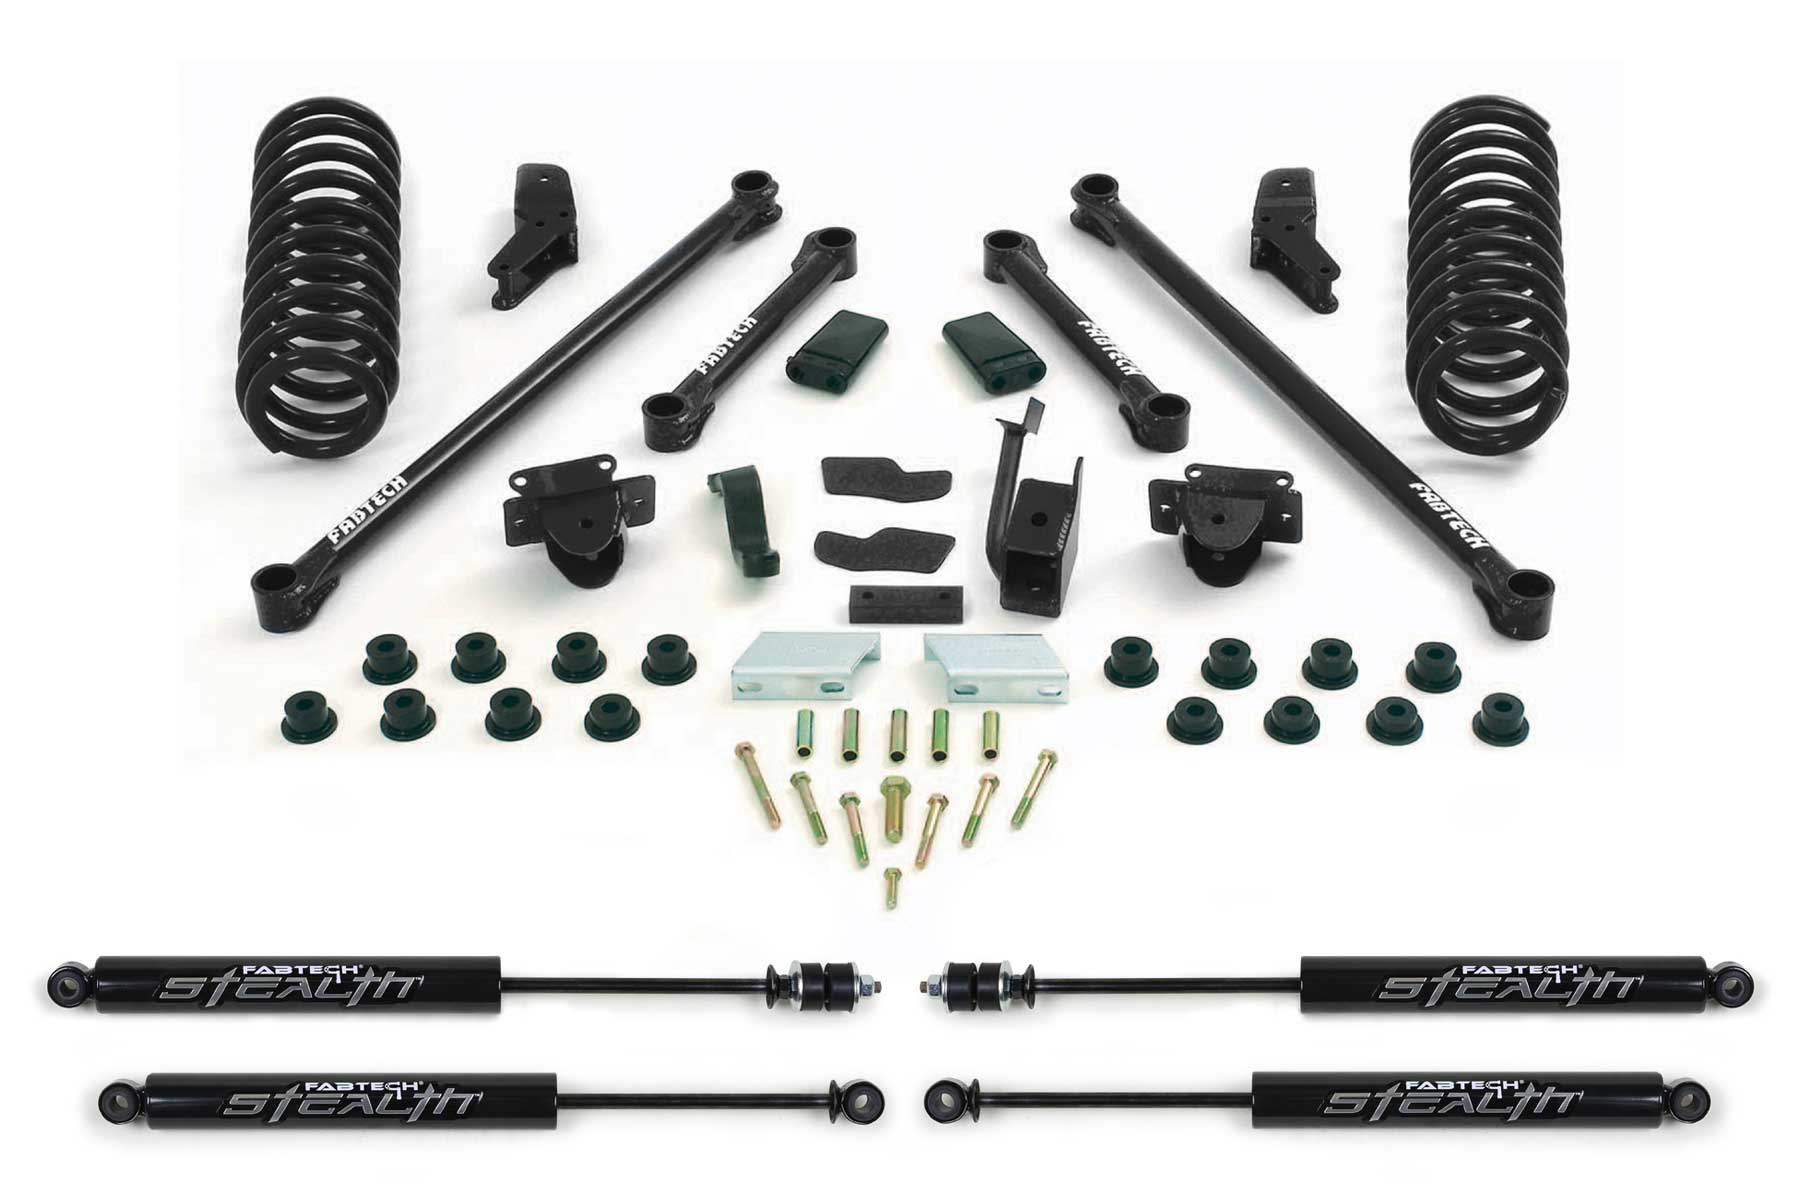 5 5 u0026quot  performance system w   stealth shocks